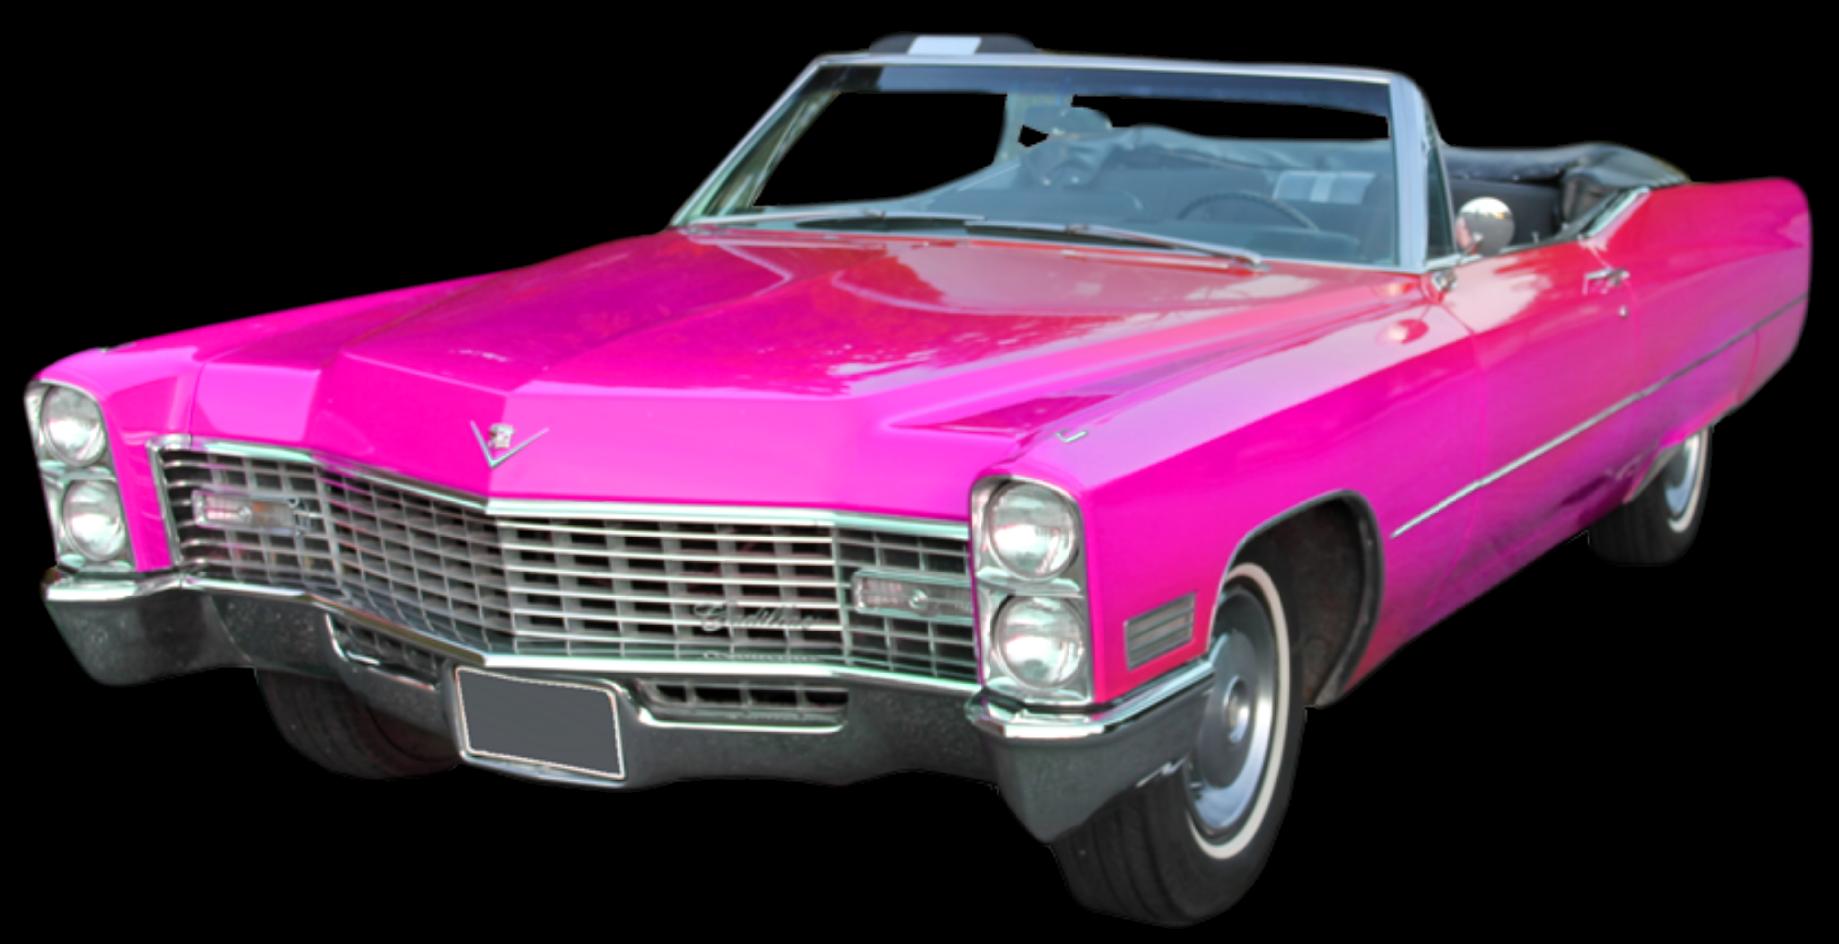 Cadillac classic car clipart clip art free library ftestickers car convertible cadillac pinkcadillac retr... clip art free library